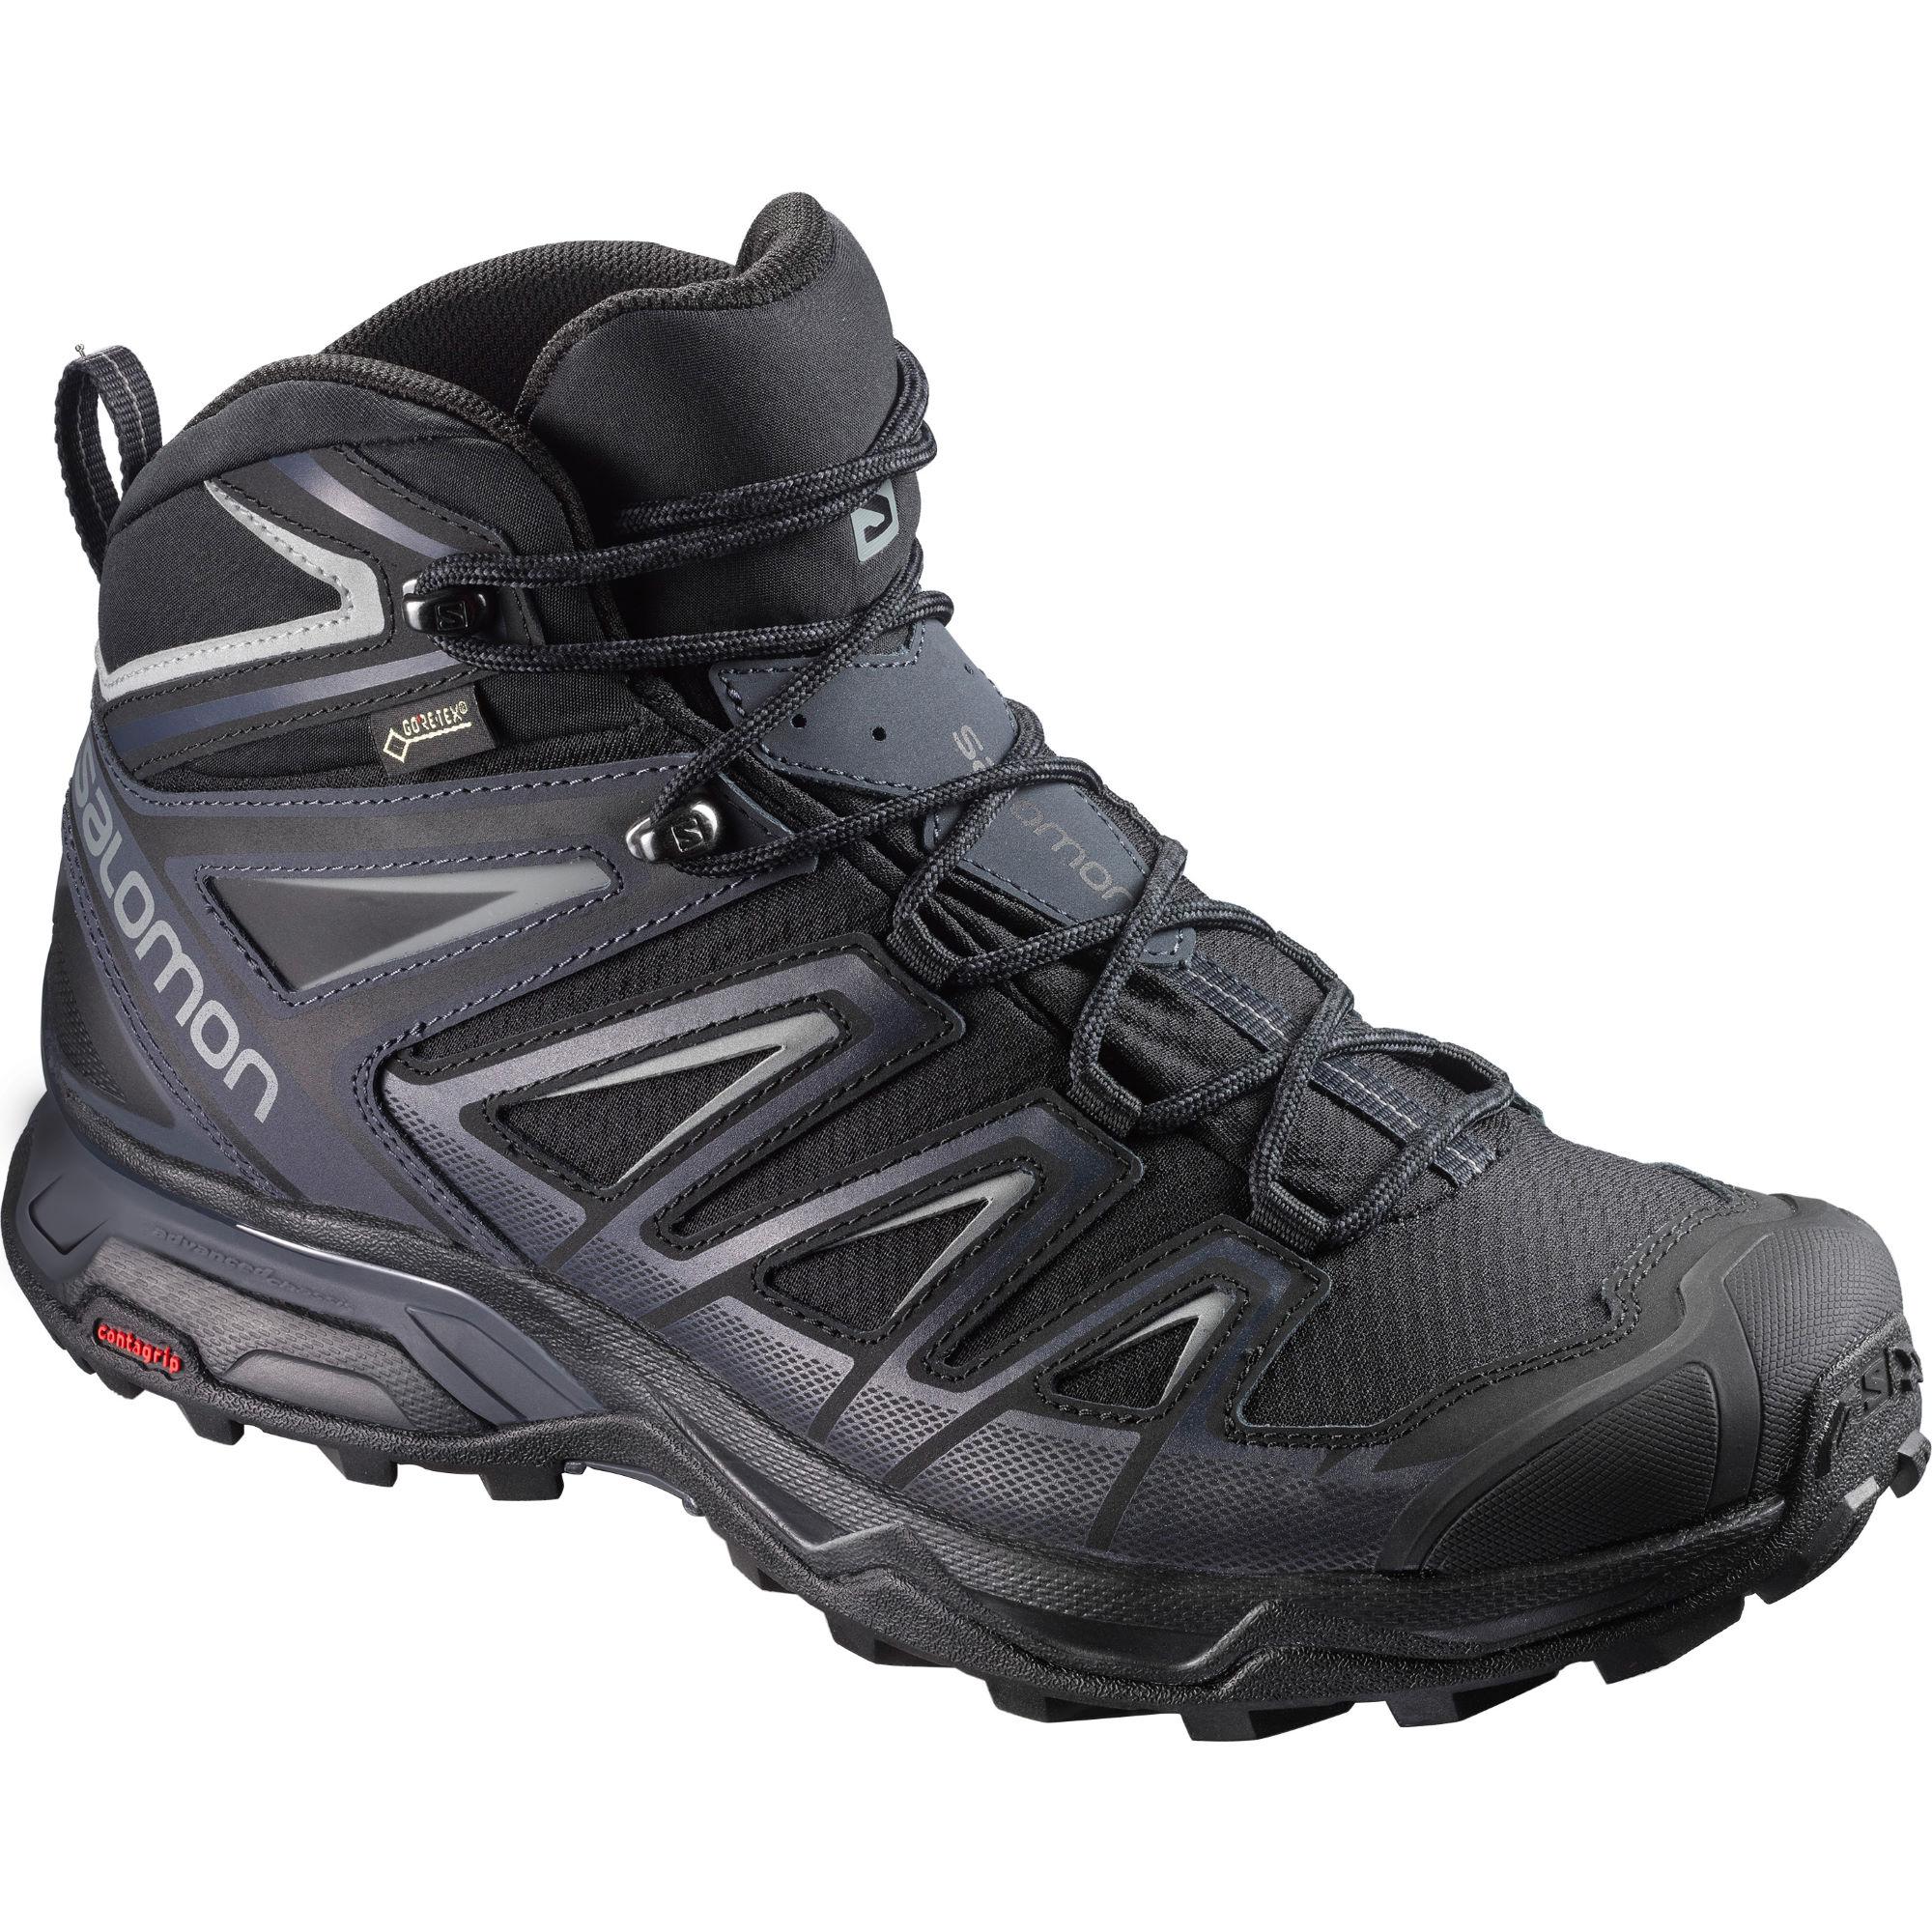 Chaussures homme Salomon X Ultra 3 Mid GTX